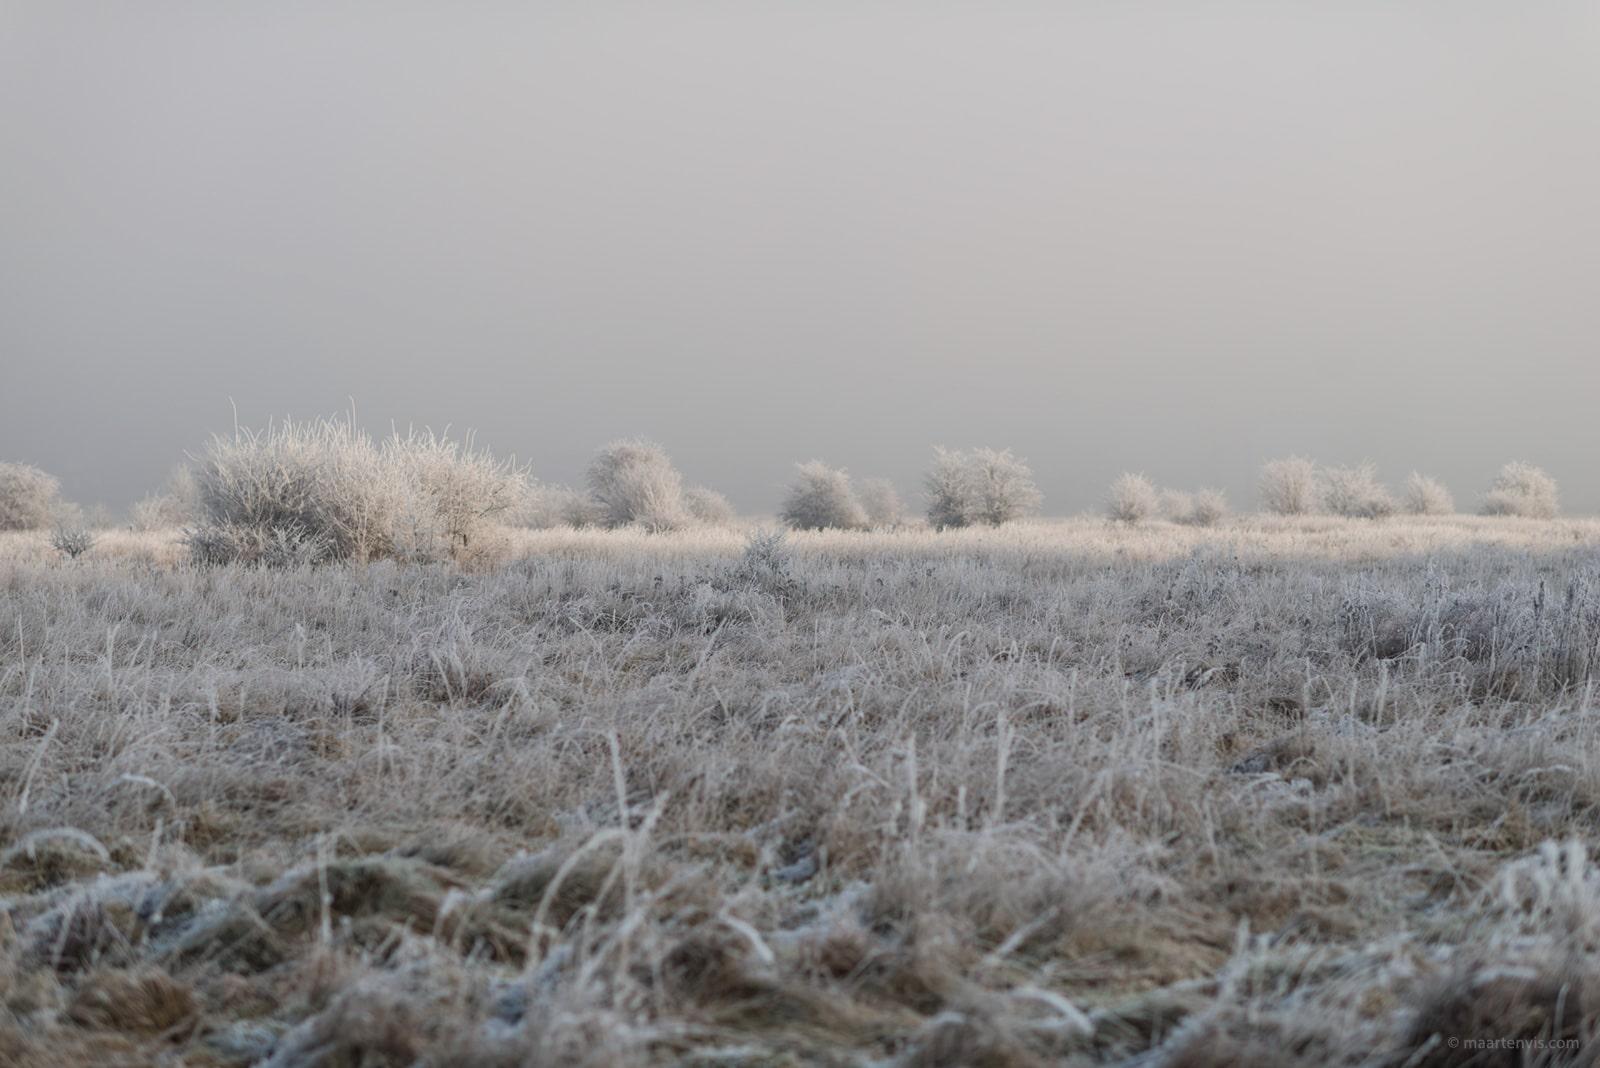 Winter in Limburg The Netherlands   Winter in Limburg The Netherlands   Winter in Limburg The Netherlands   Winter in Limburg The Netherlands   Winter in Limburg The Netherlands   Winter in Limburg The Netherlands   Winter in Limburg The Netherlands